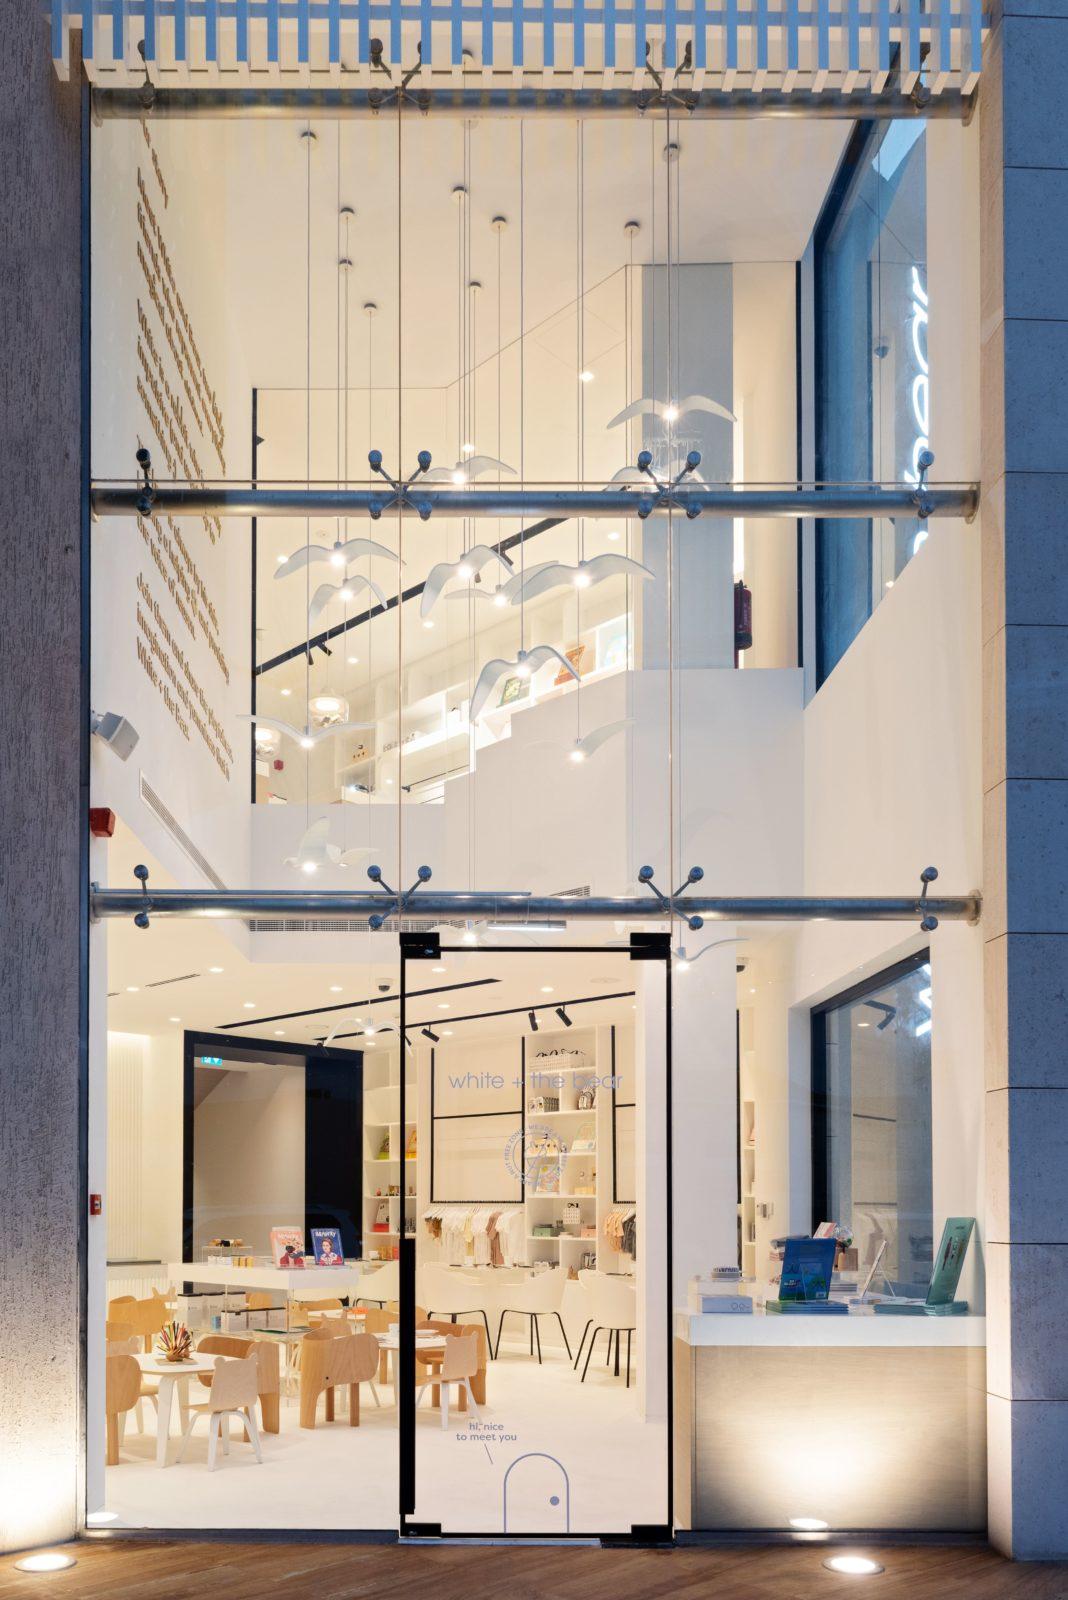 Restaurante para niños White and The bear. Dubai. Interiorismo minimalista. Exterior. Fachada acristalada